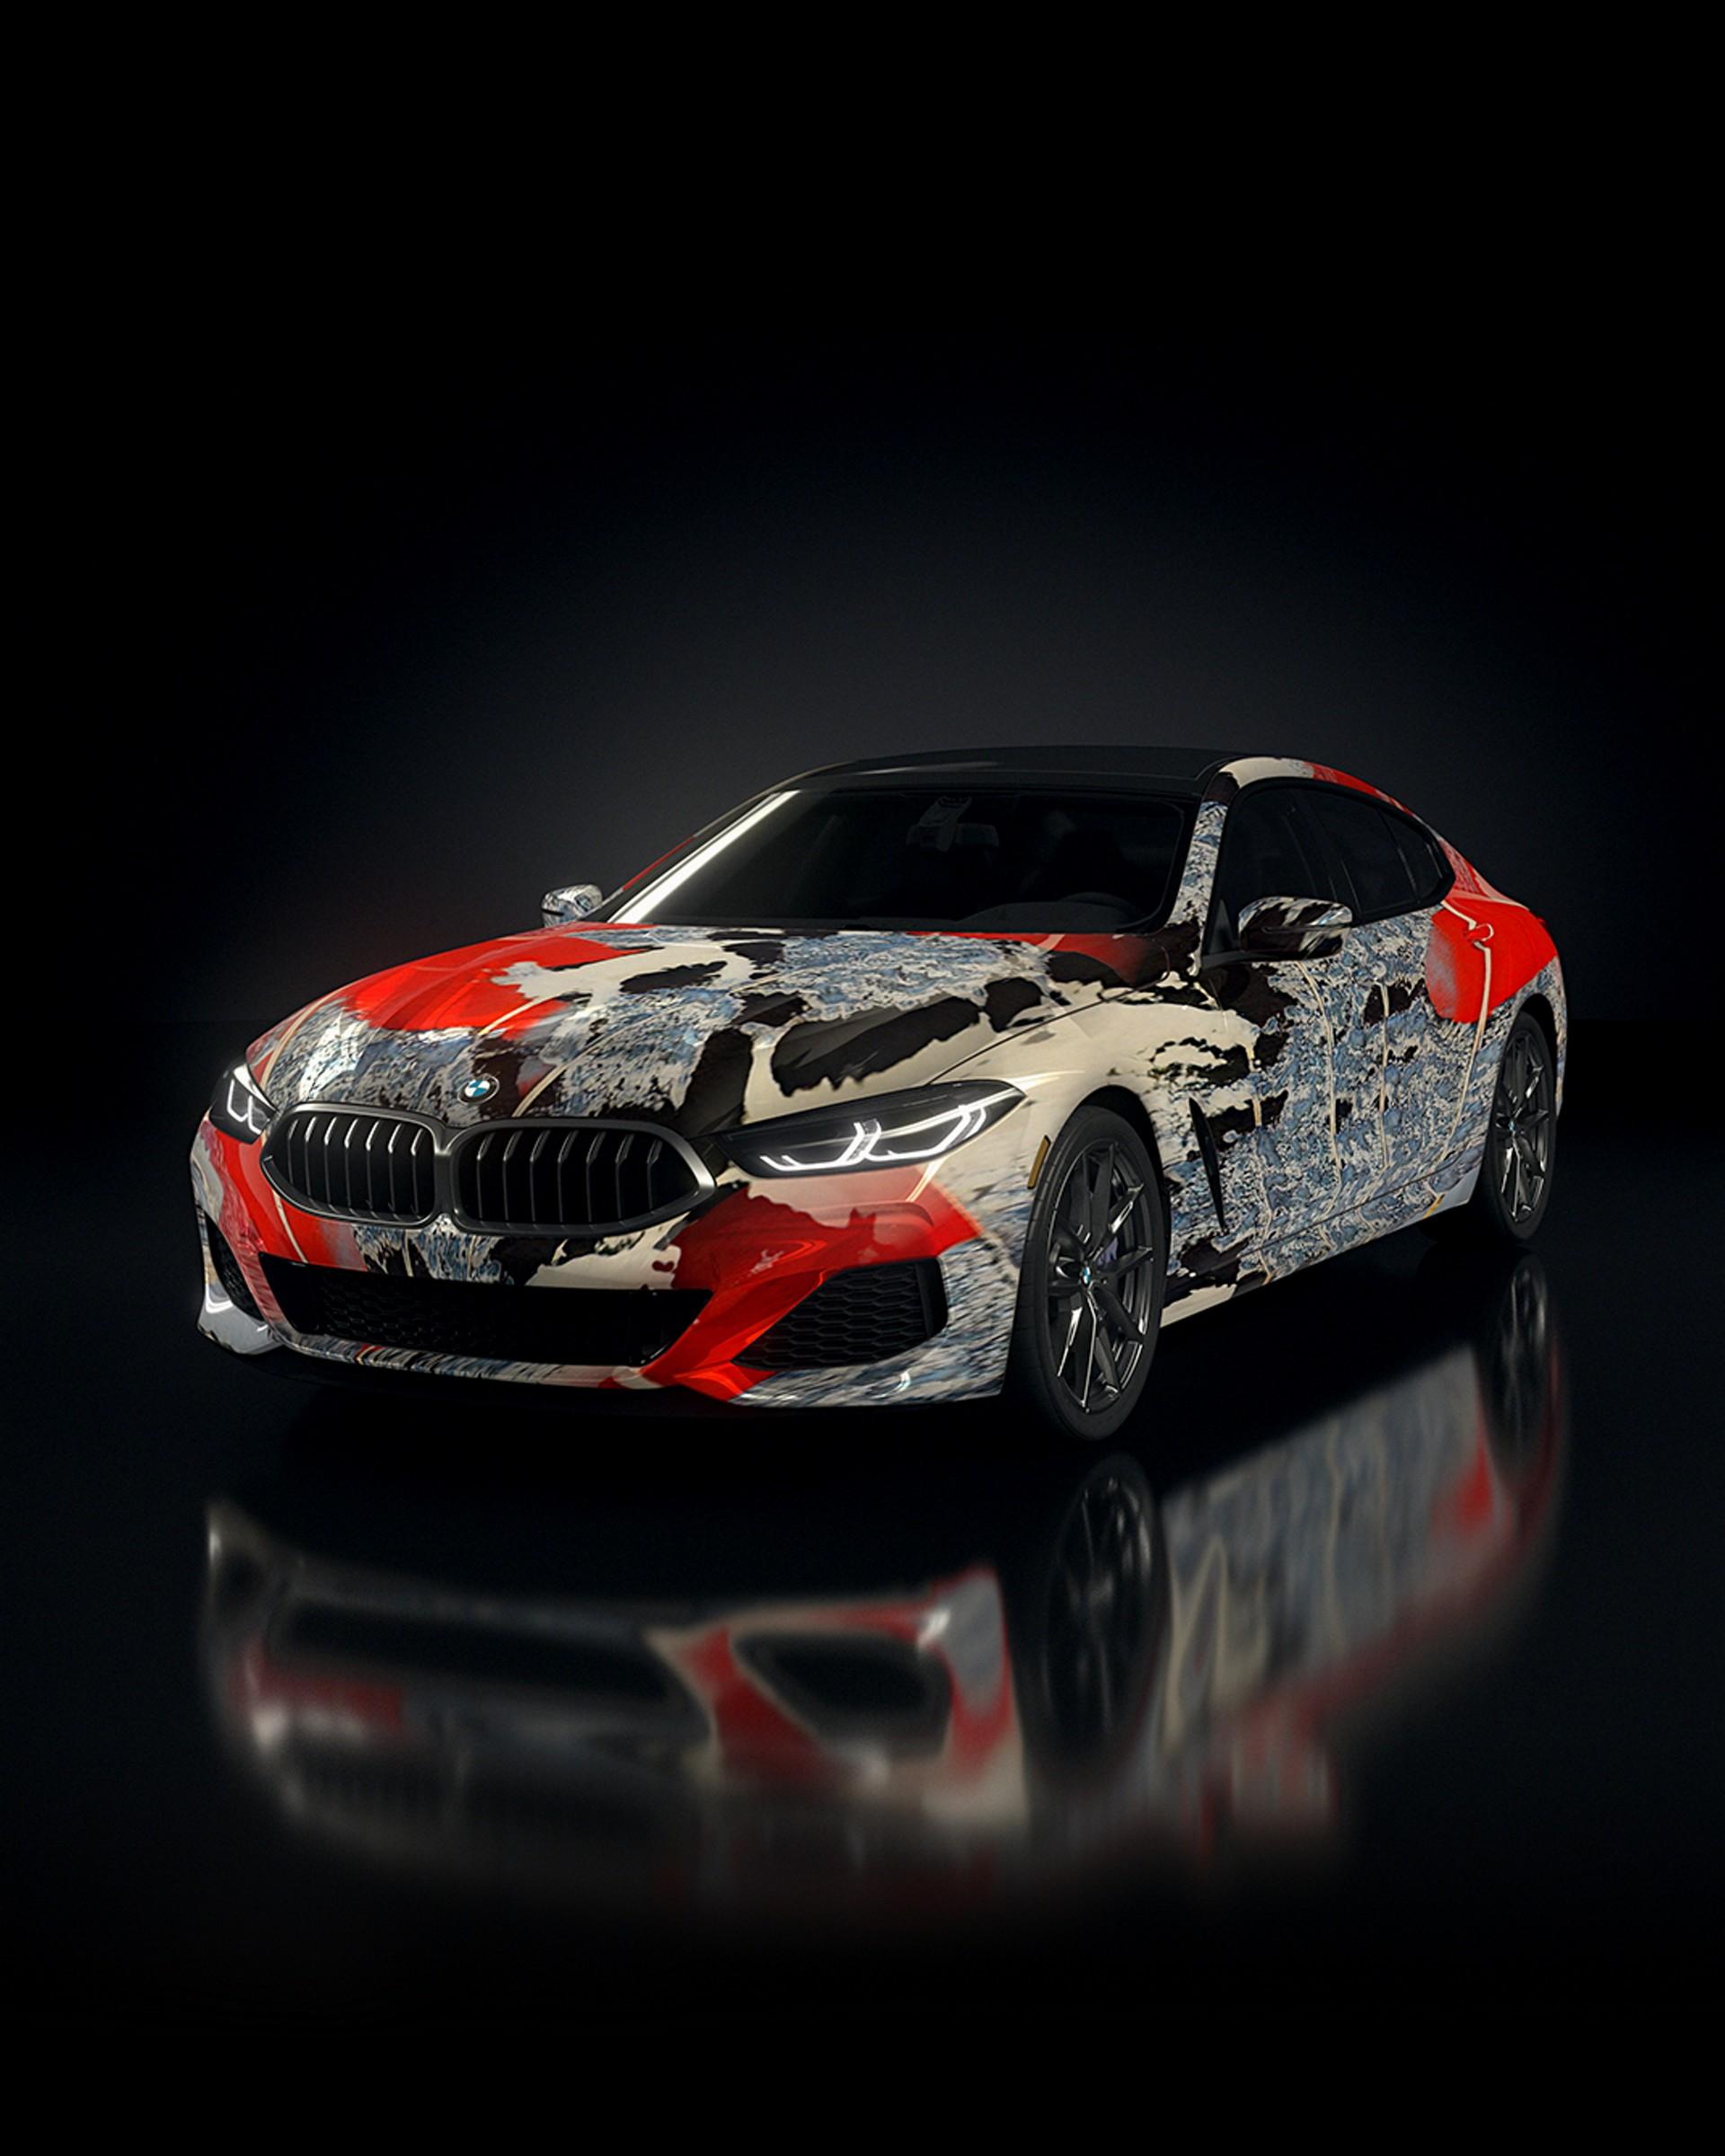 BMW-8-Series-Gran-Coupe-art-car-22